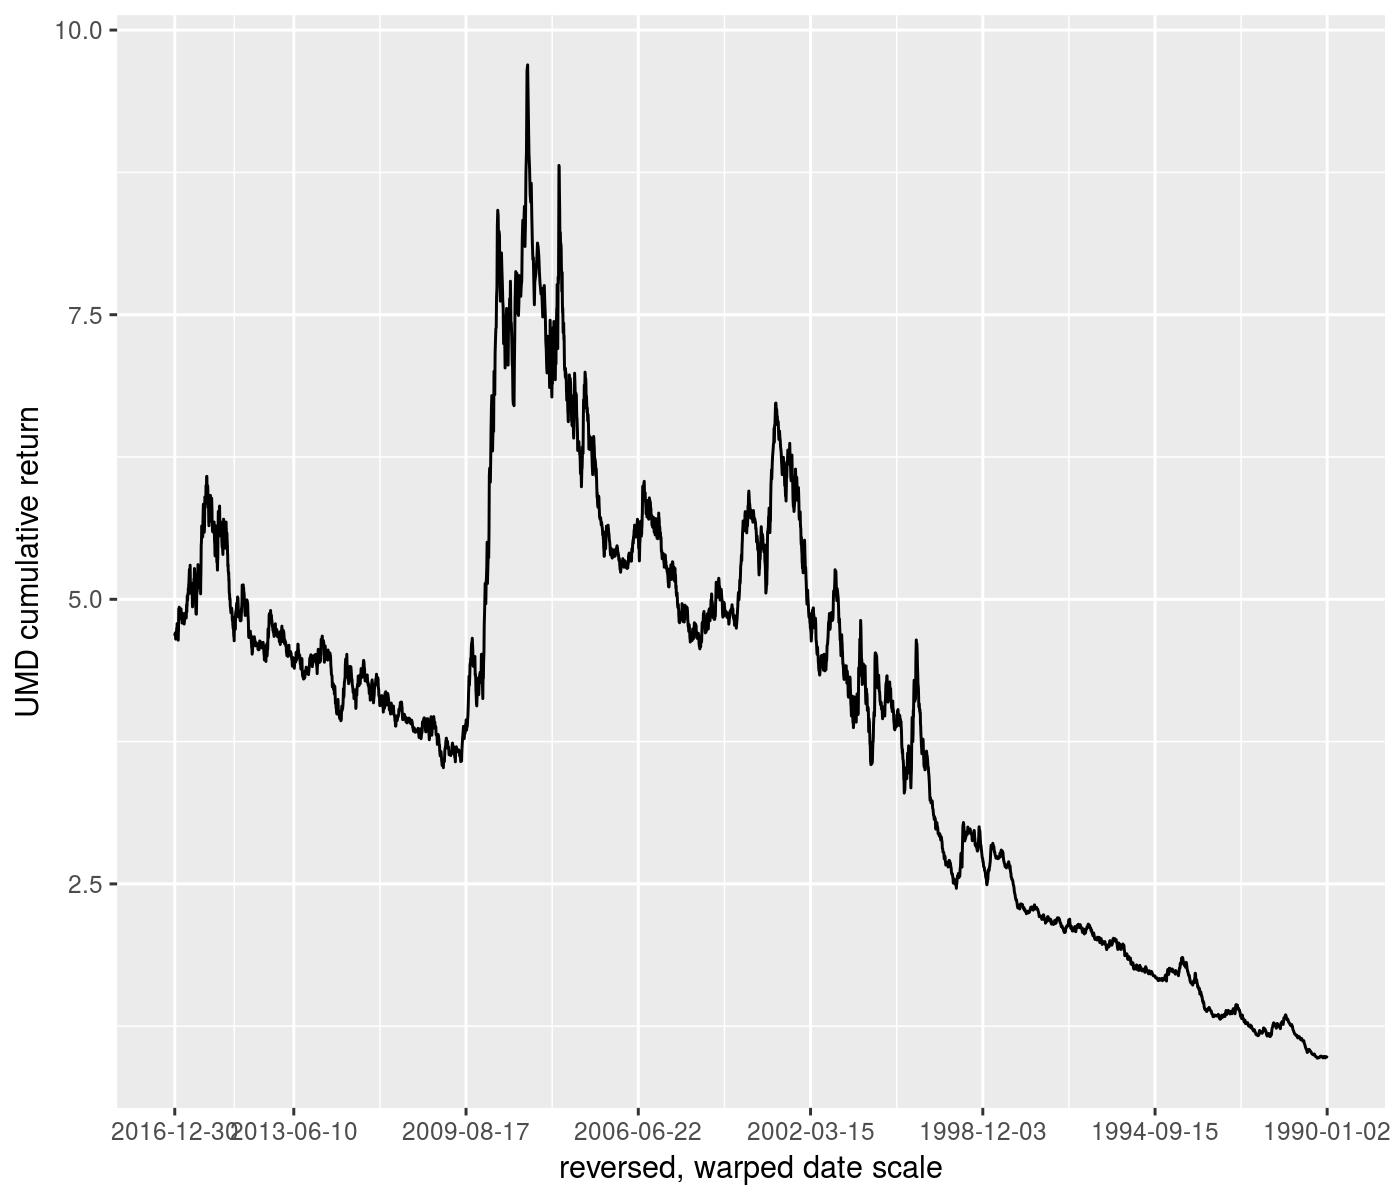 plot of chunk interp_trans